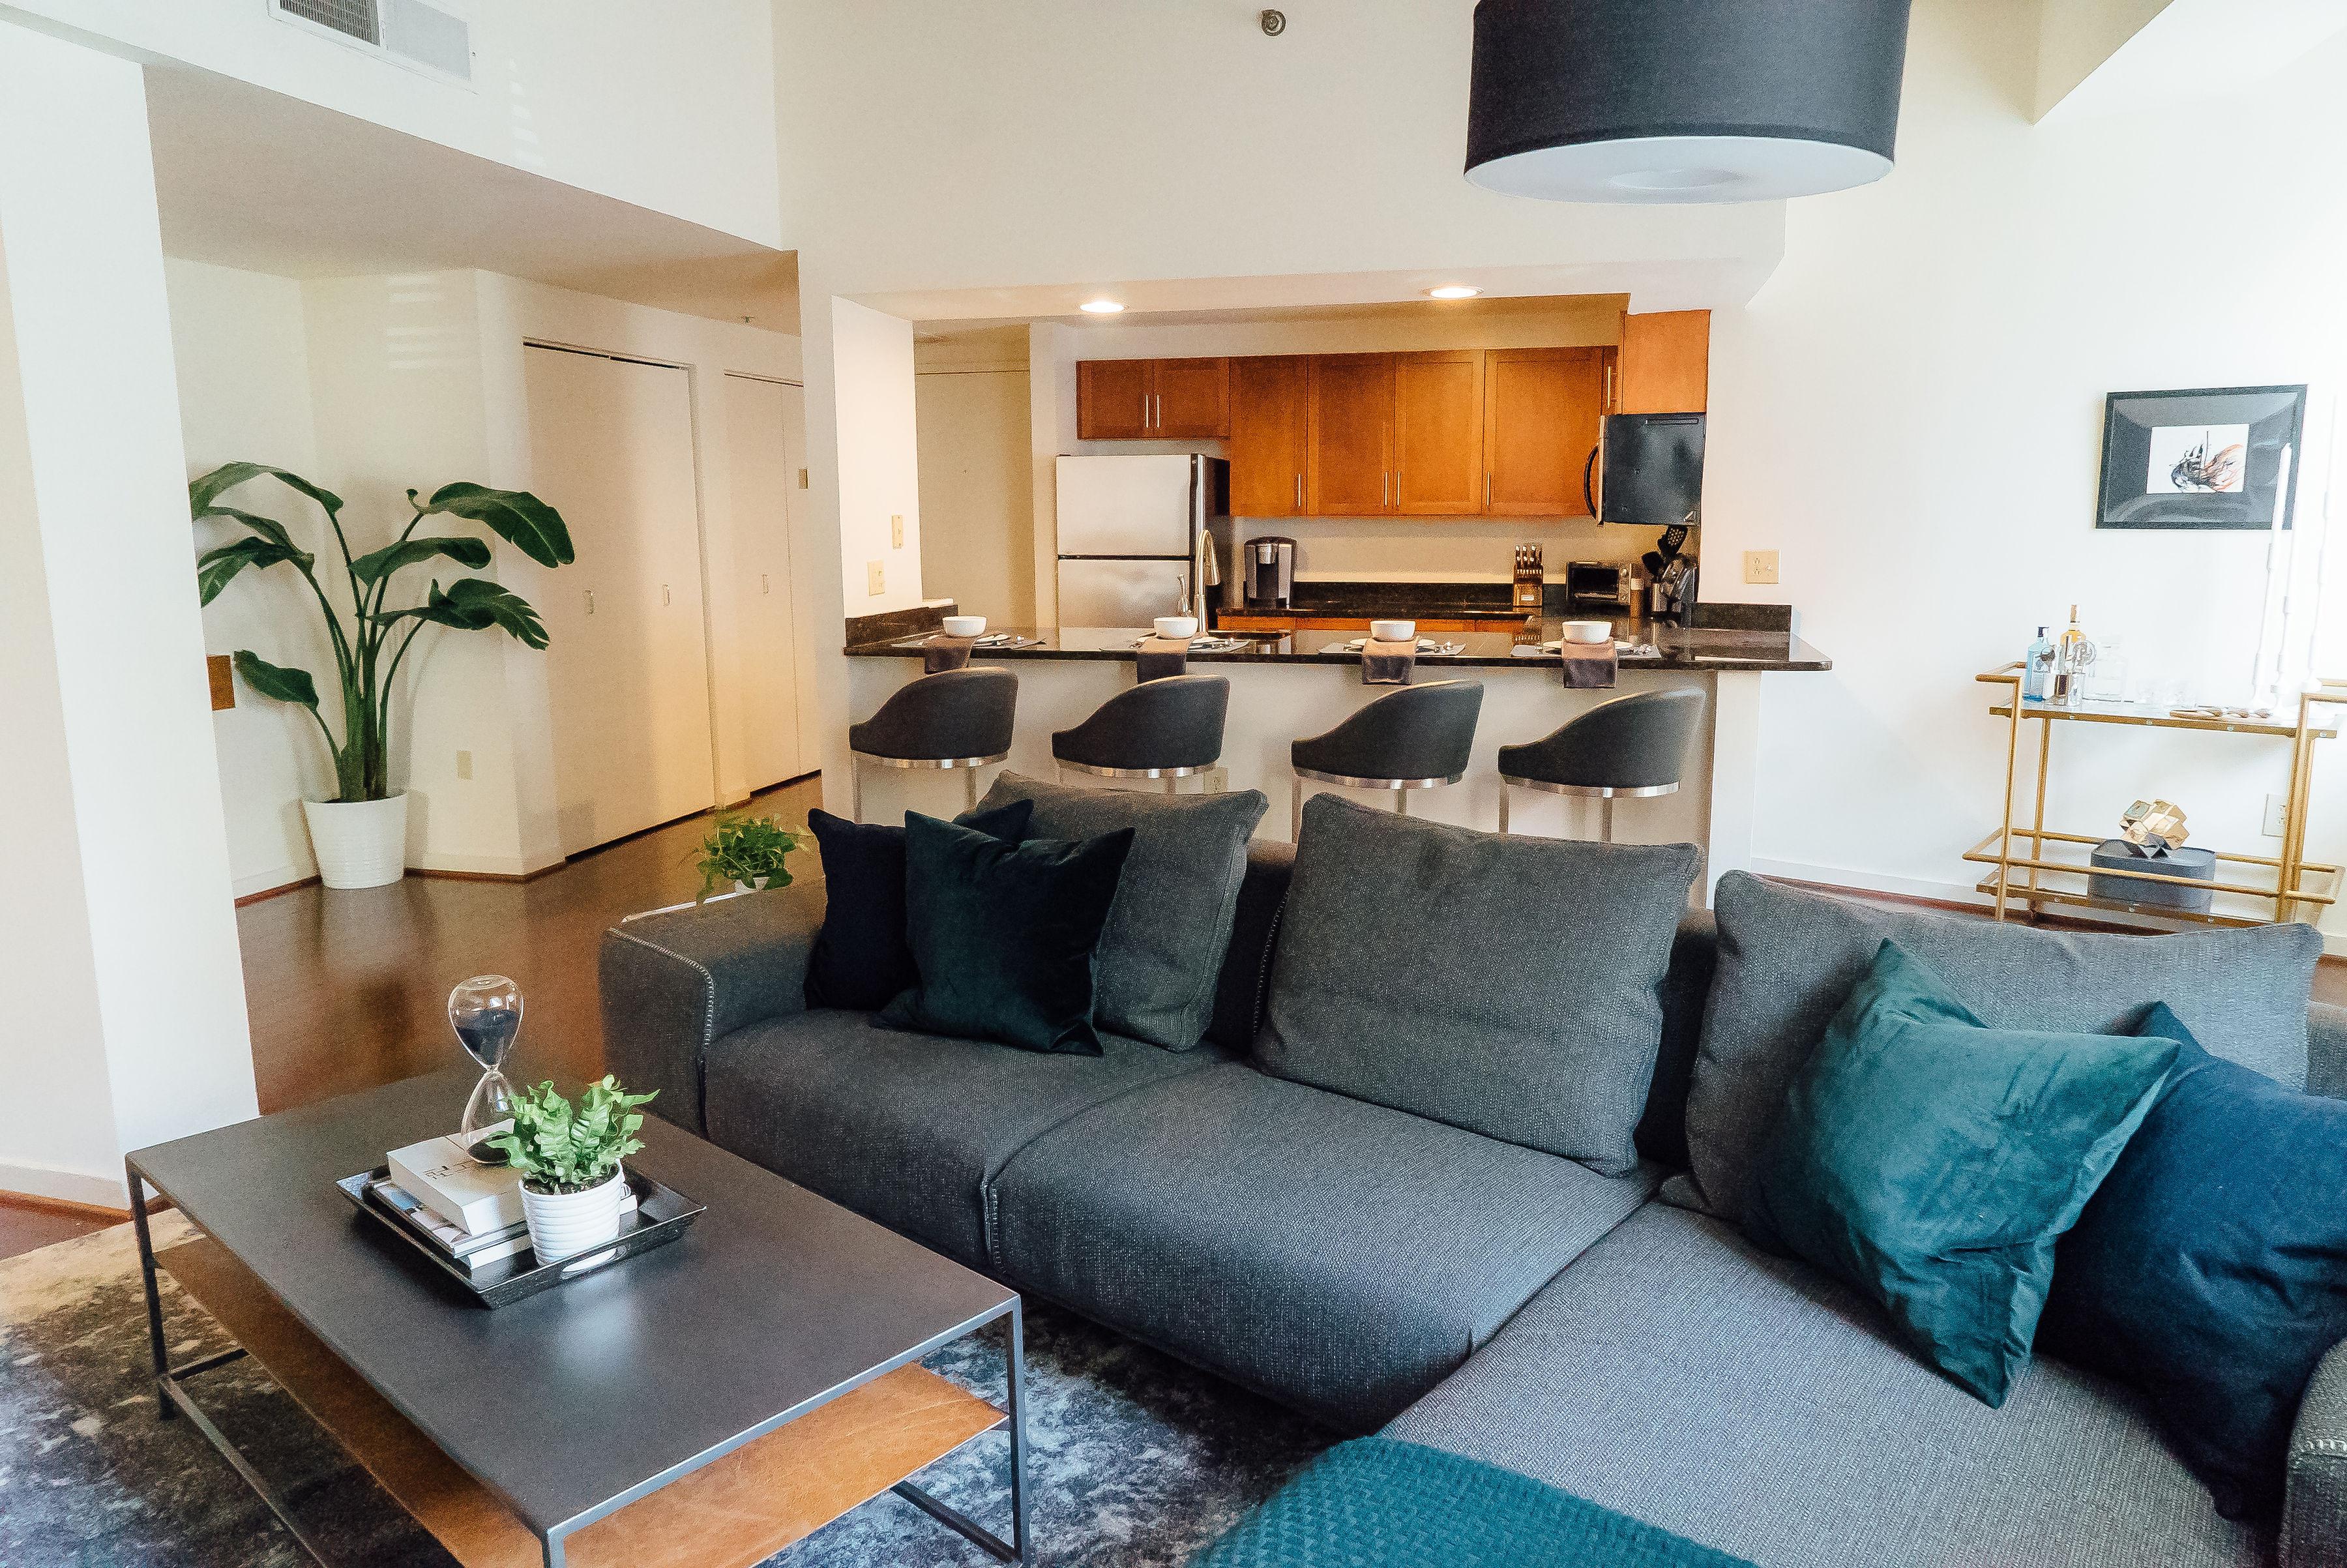 Interior Designed living room in a Center City apartment